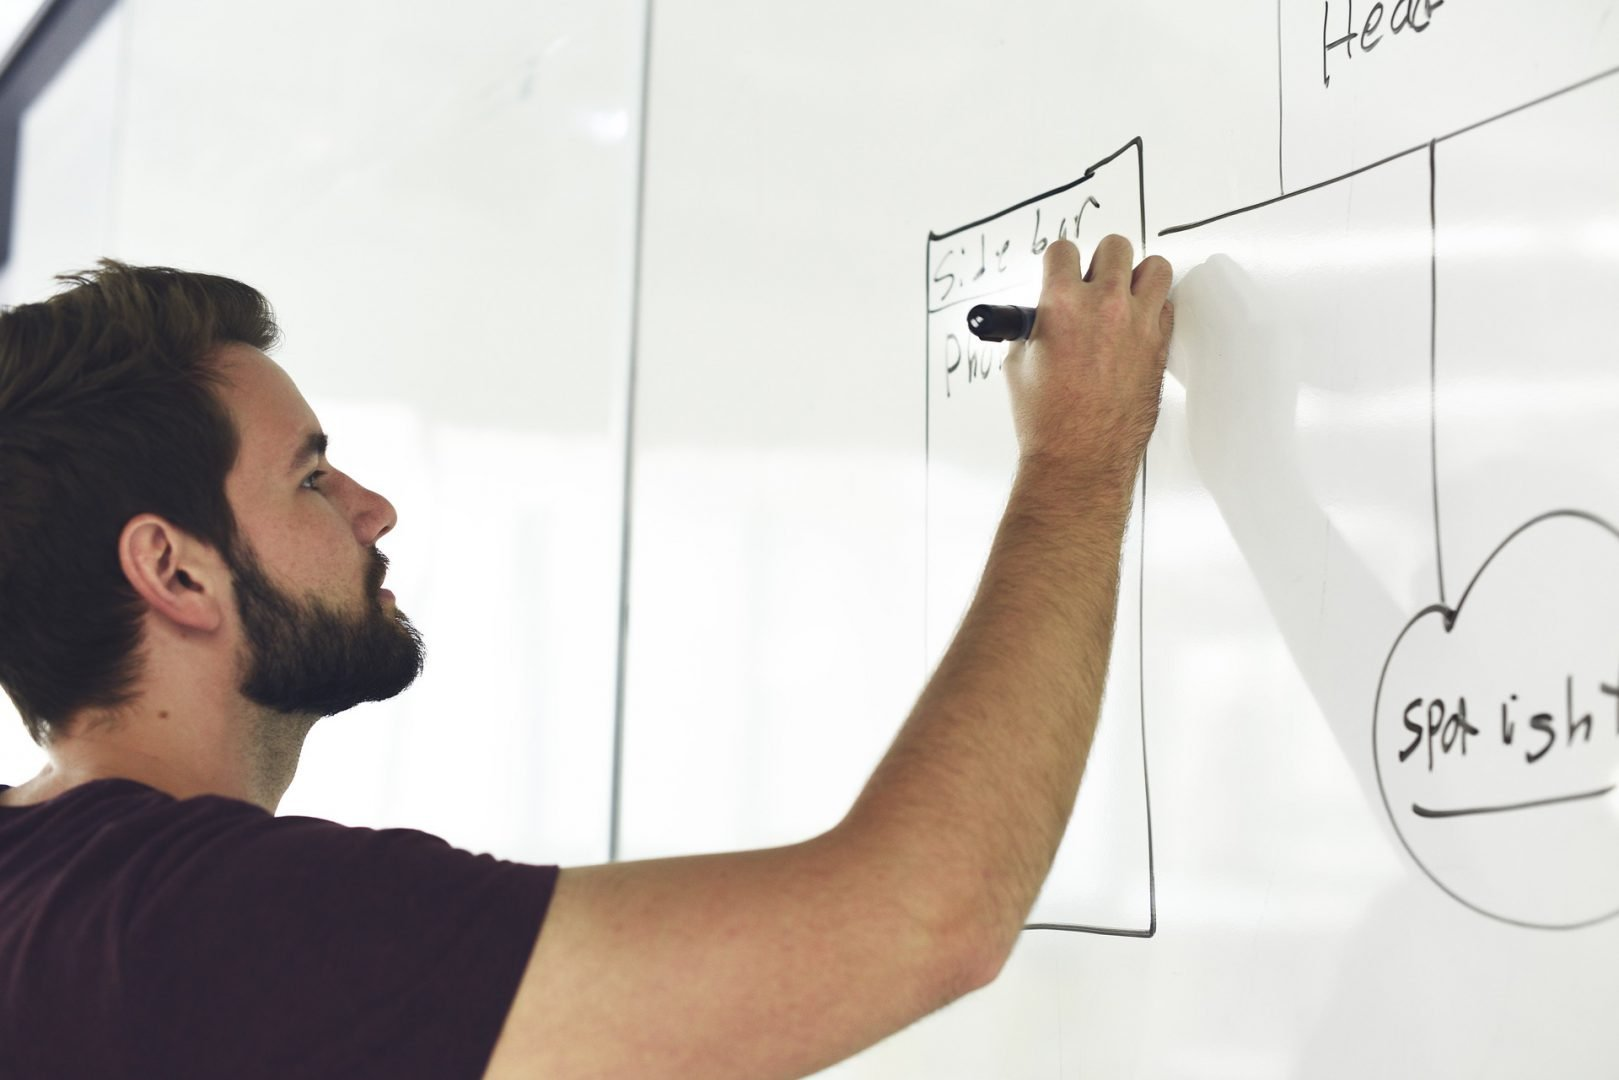 recruitment event ideas workshop